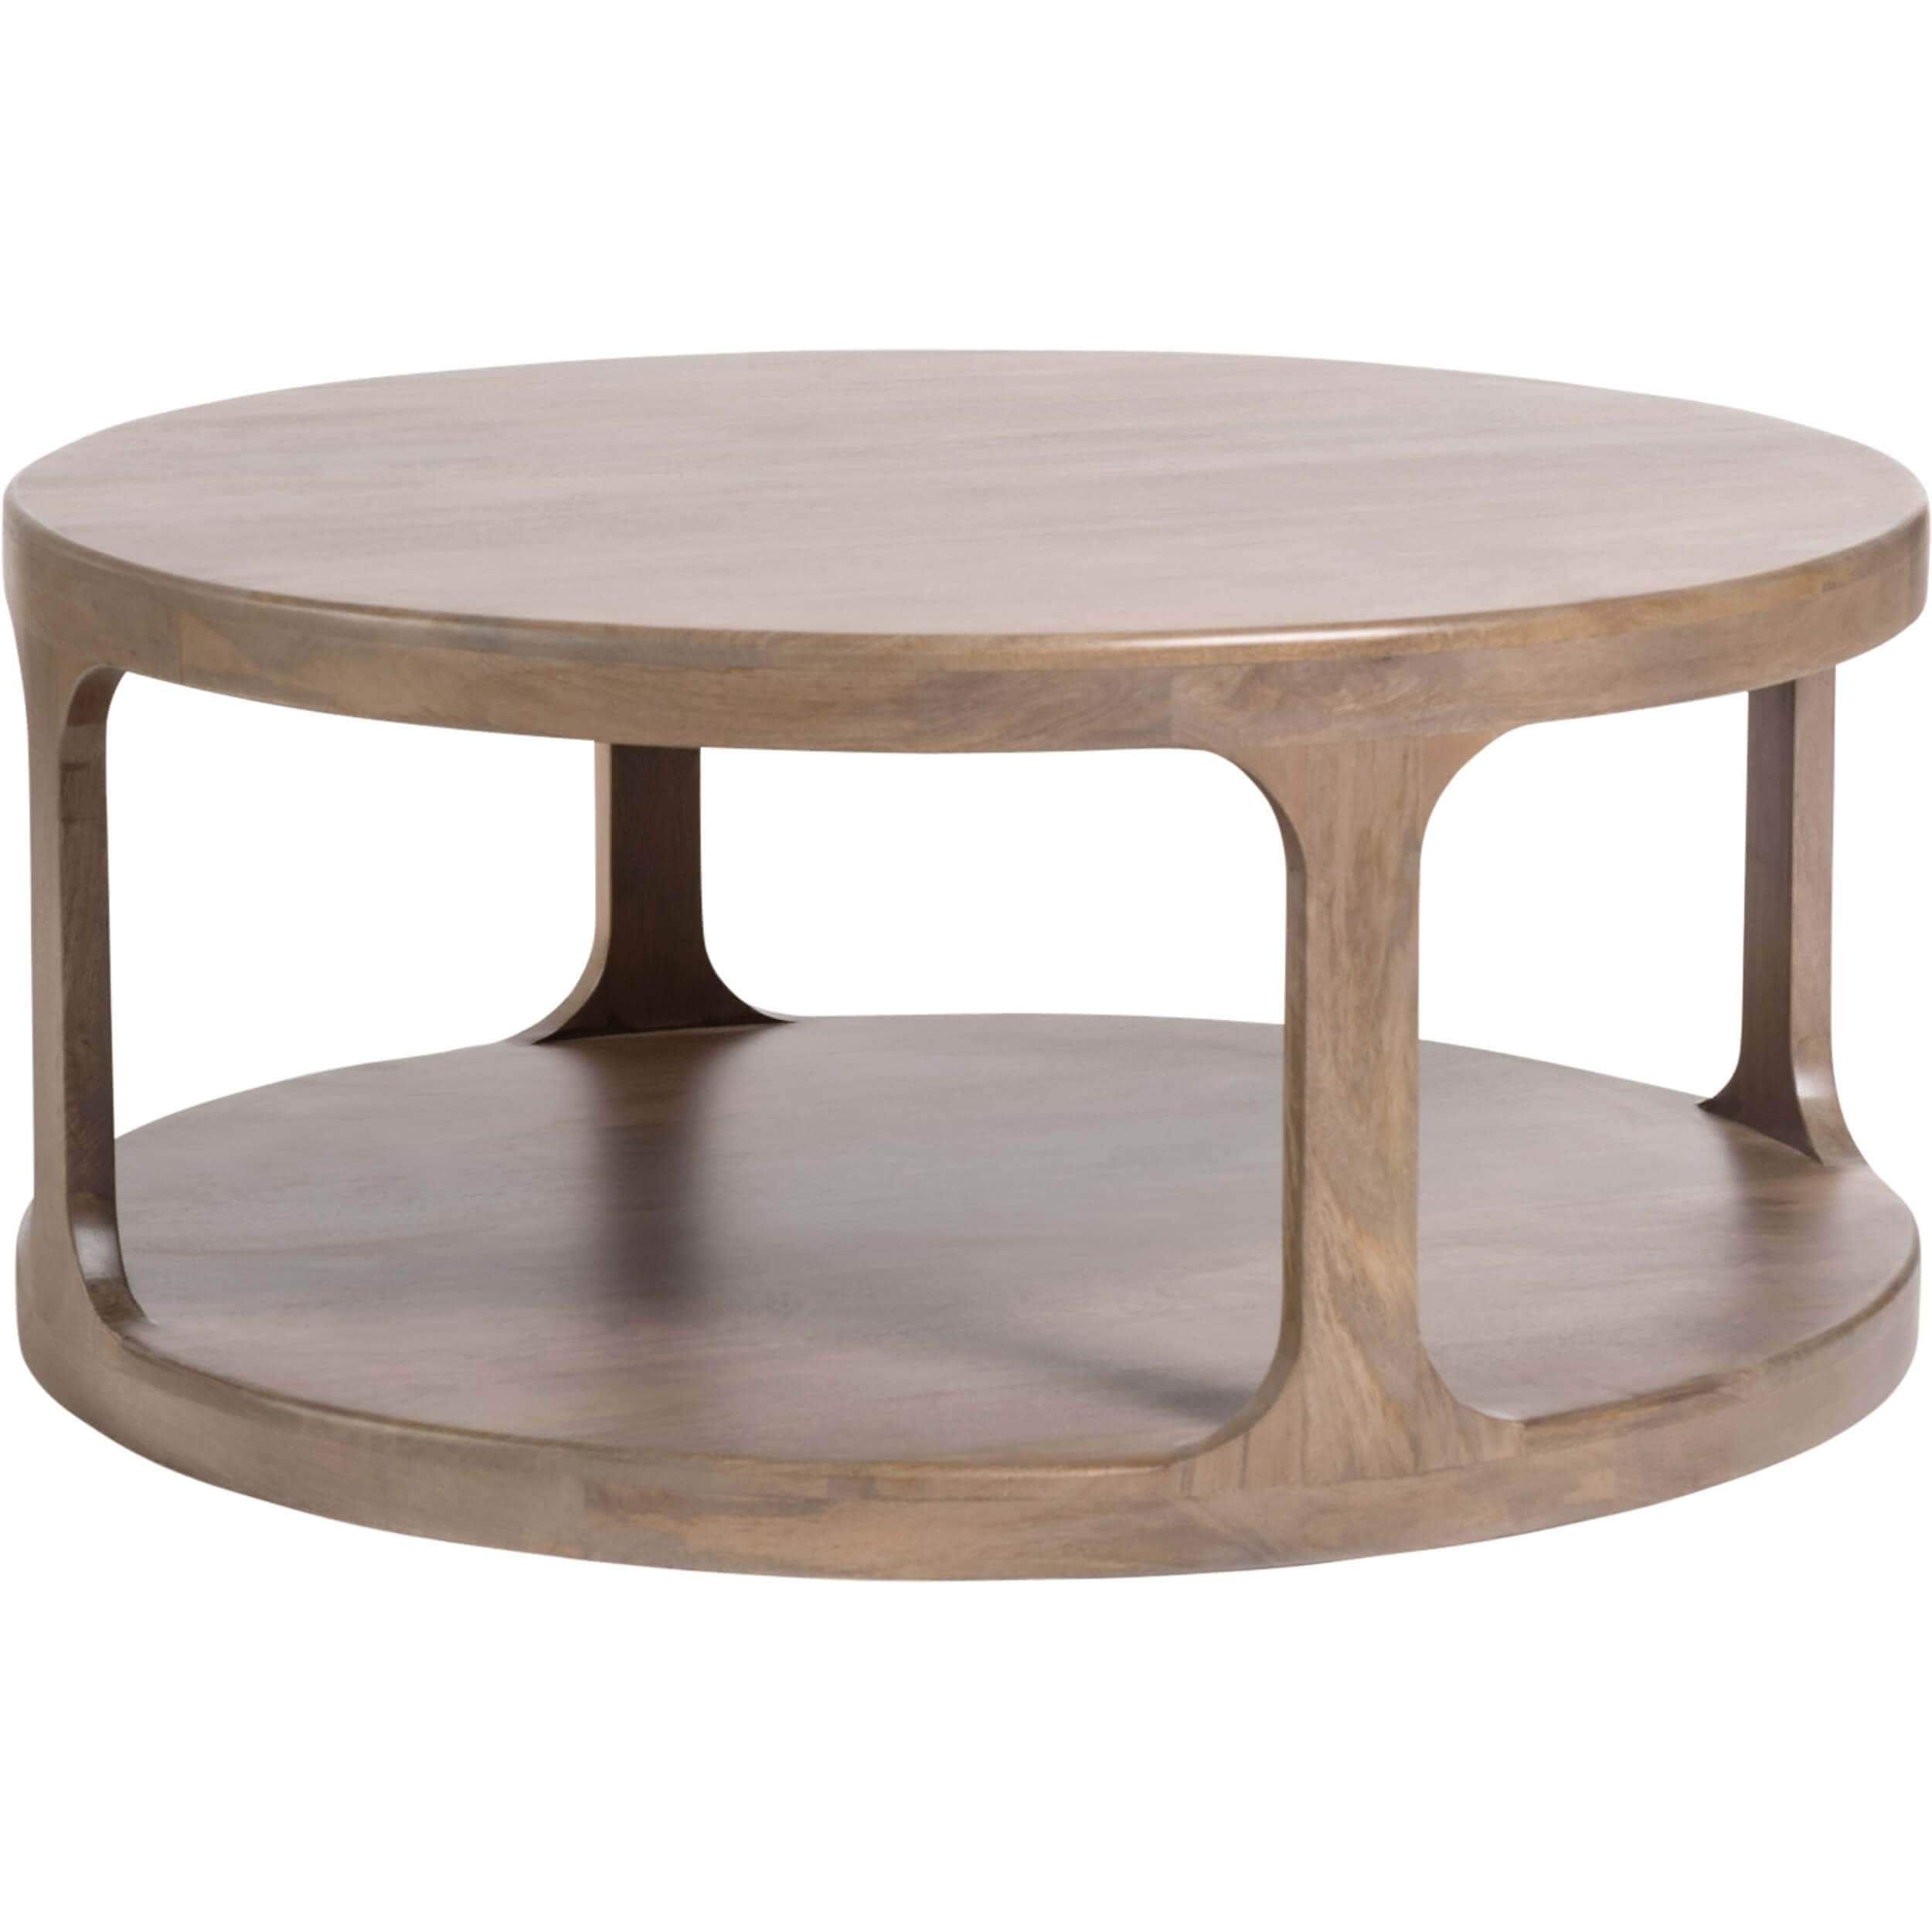 Mason Coffee Table Coffee Table Round Wood Coffee Table Coffee Table Wood [ 2500 x 2500 Pixel ]